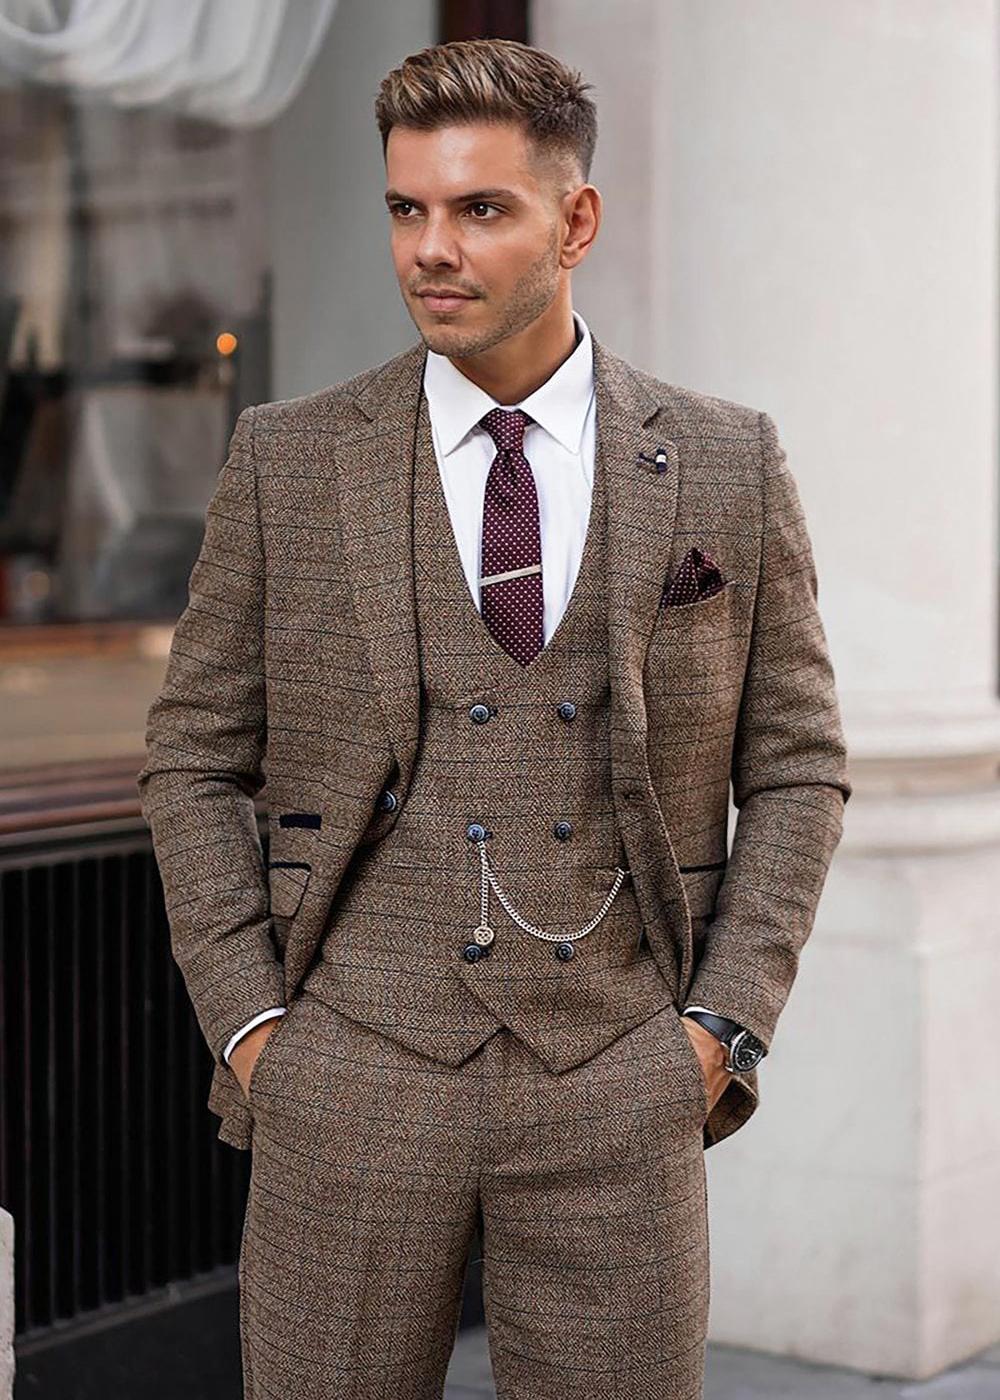 how to wear brown tweed suit